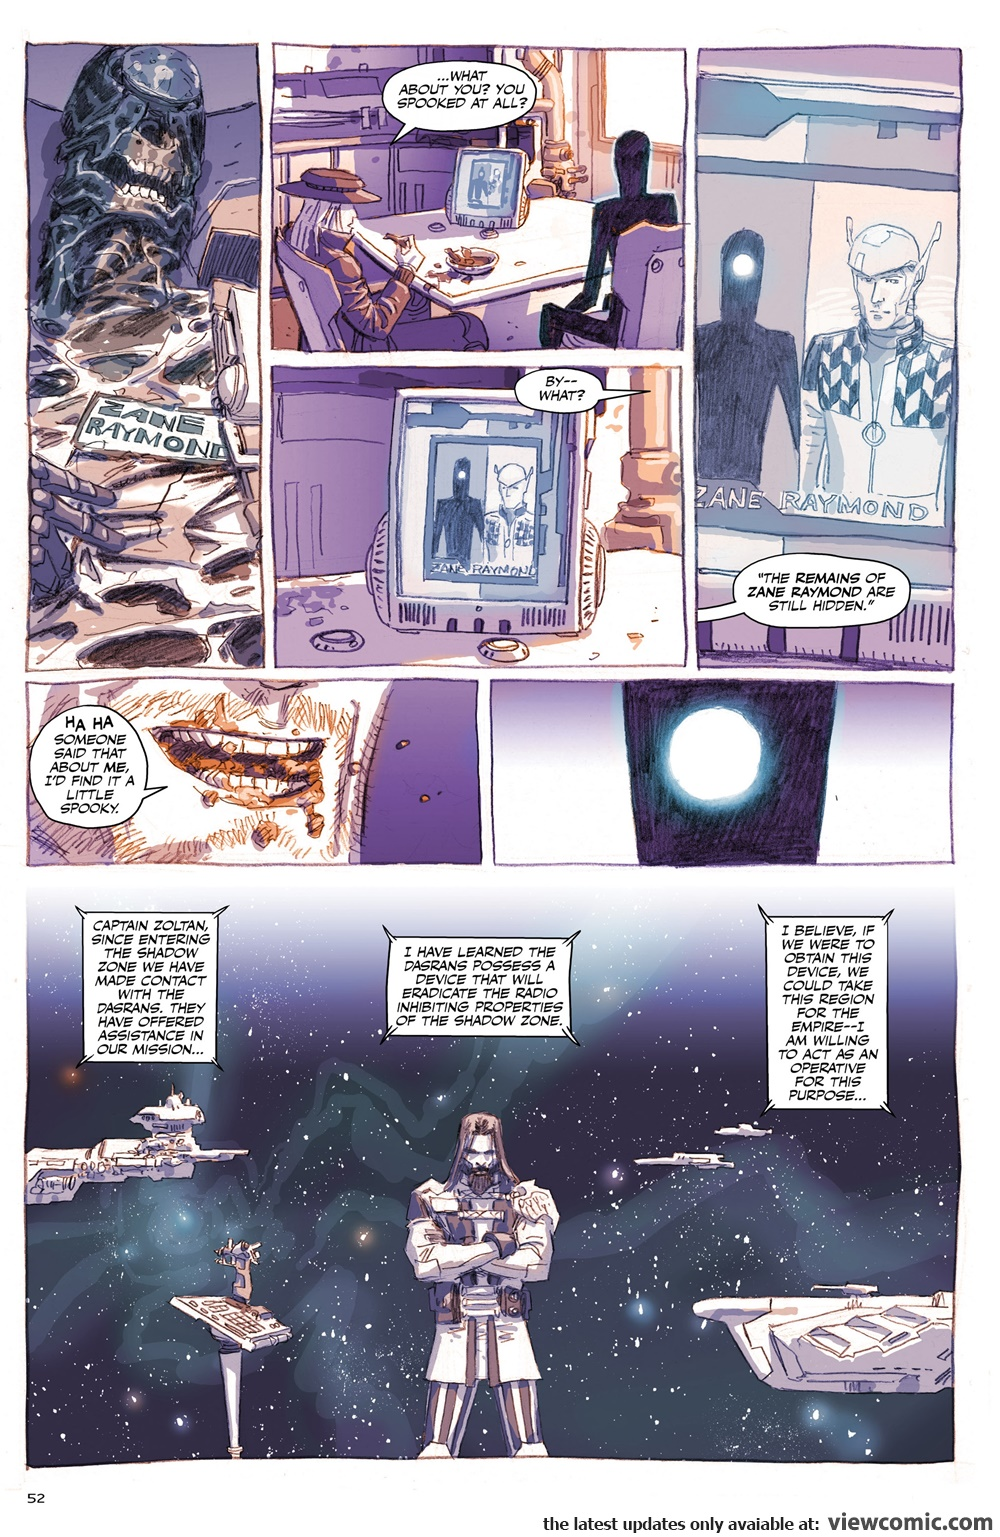 Paklis 005 (2017) ………………………………… | Viewcomic reading comics online